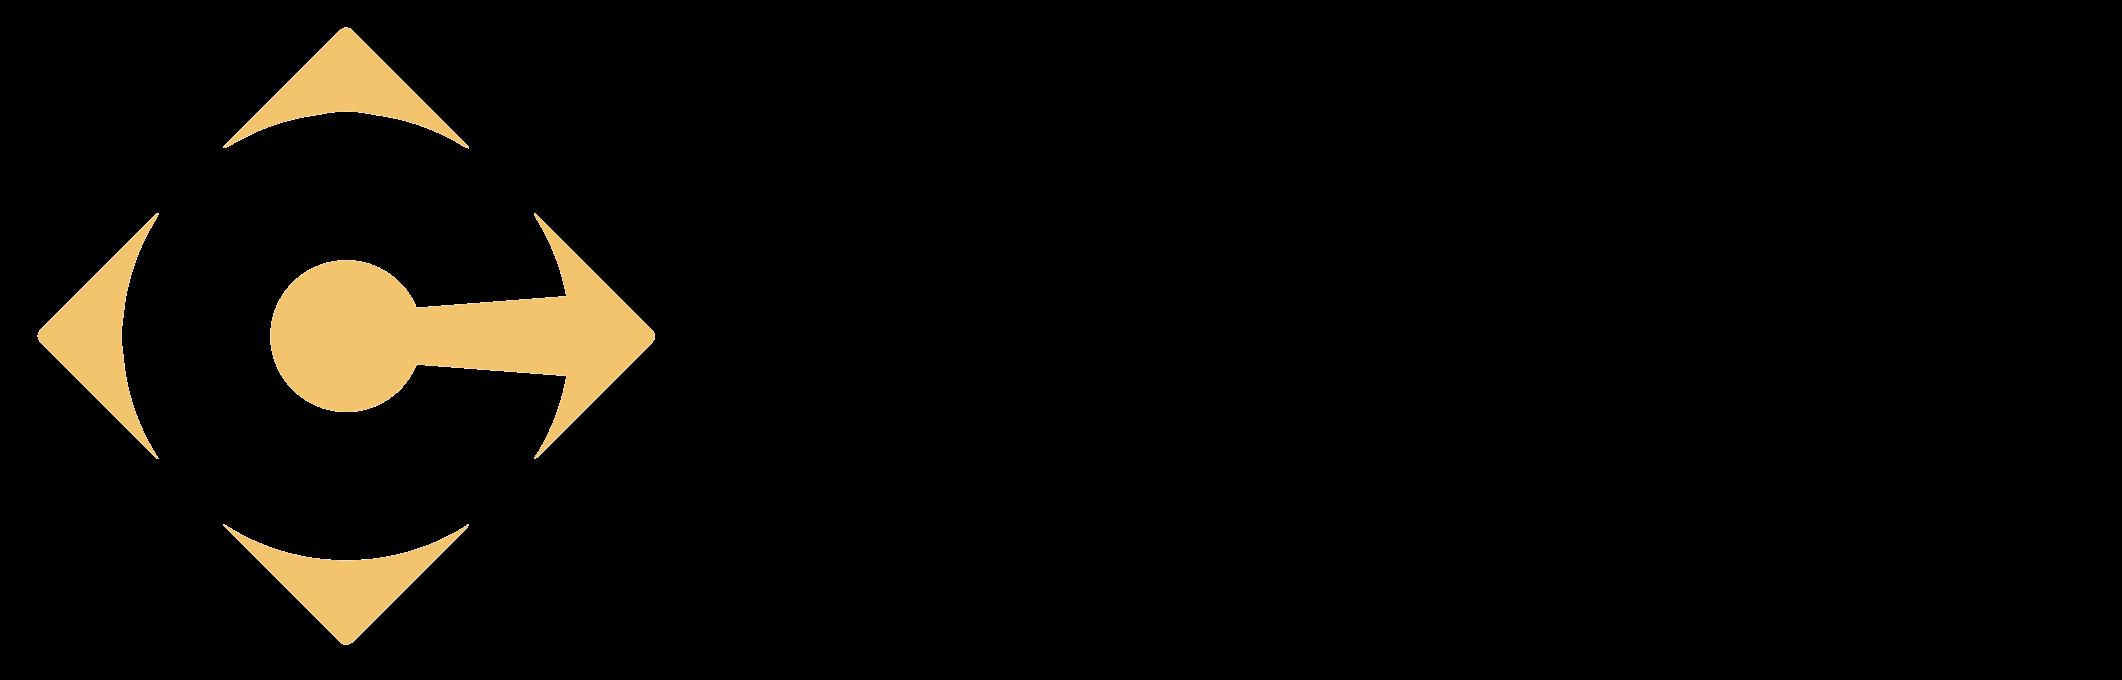 xlogo_black_text.png.pagespeed.ic.8idgrmJSi2